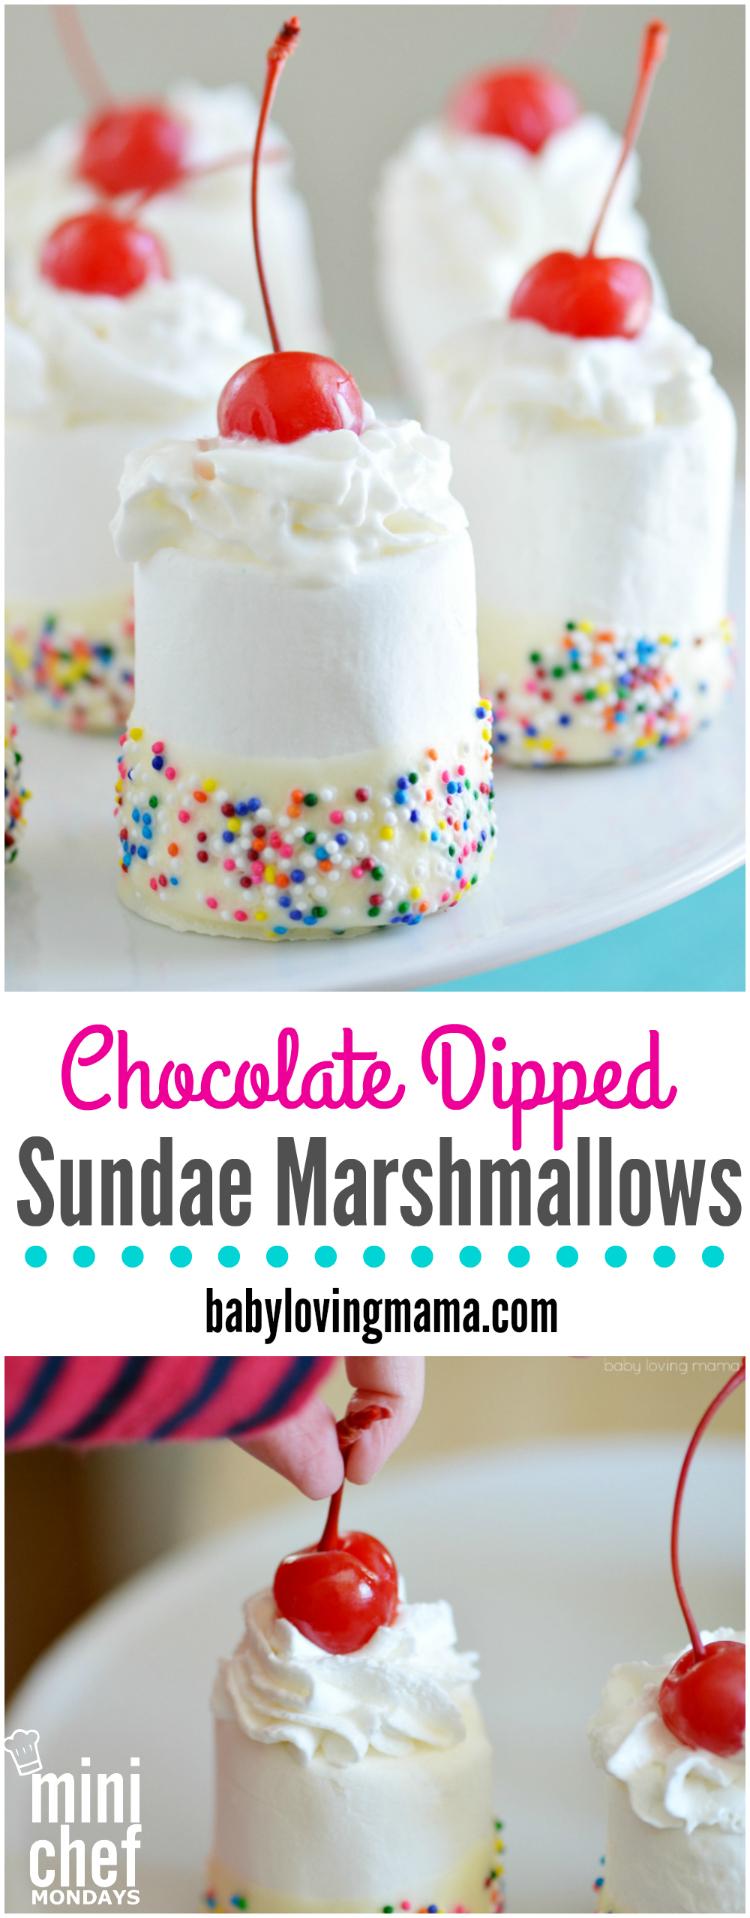 Chocolate Dipped Sundae Marshmallows for Mini Chef Mondays